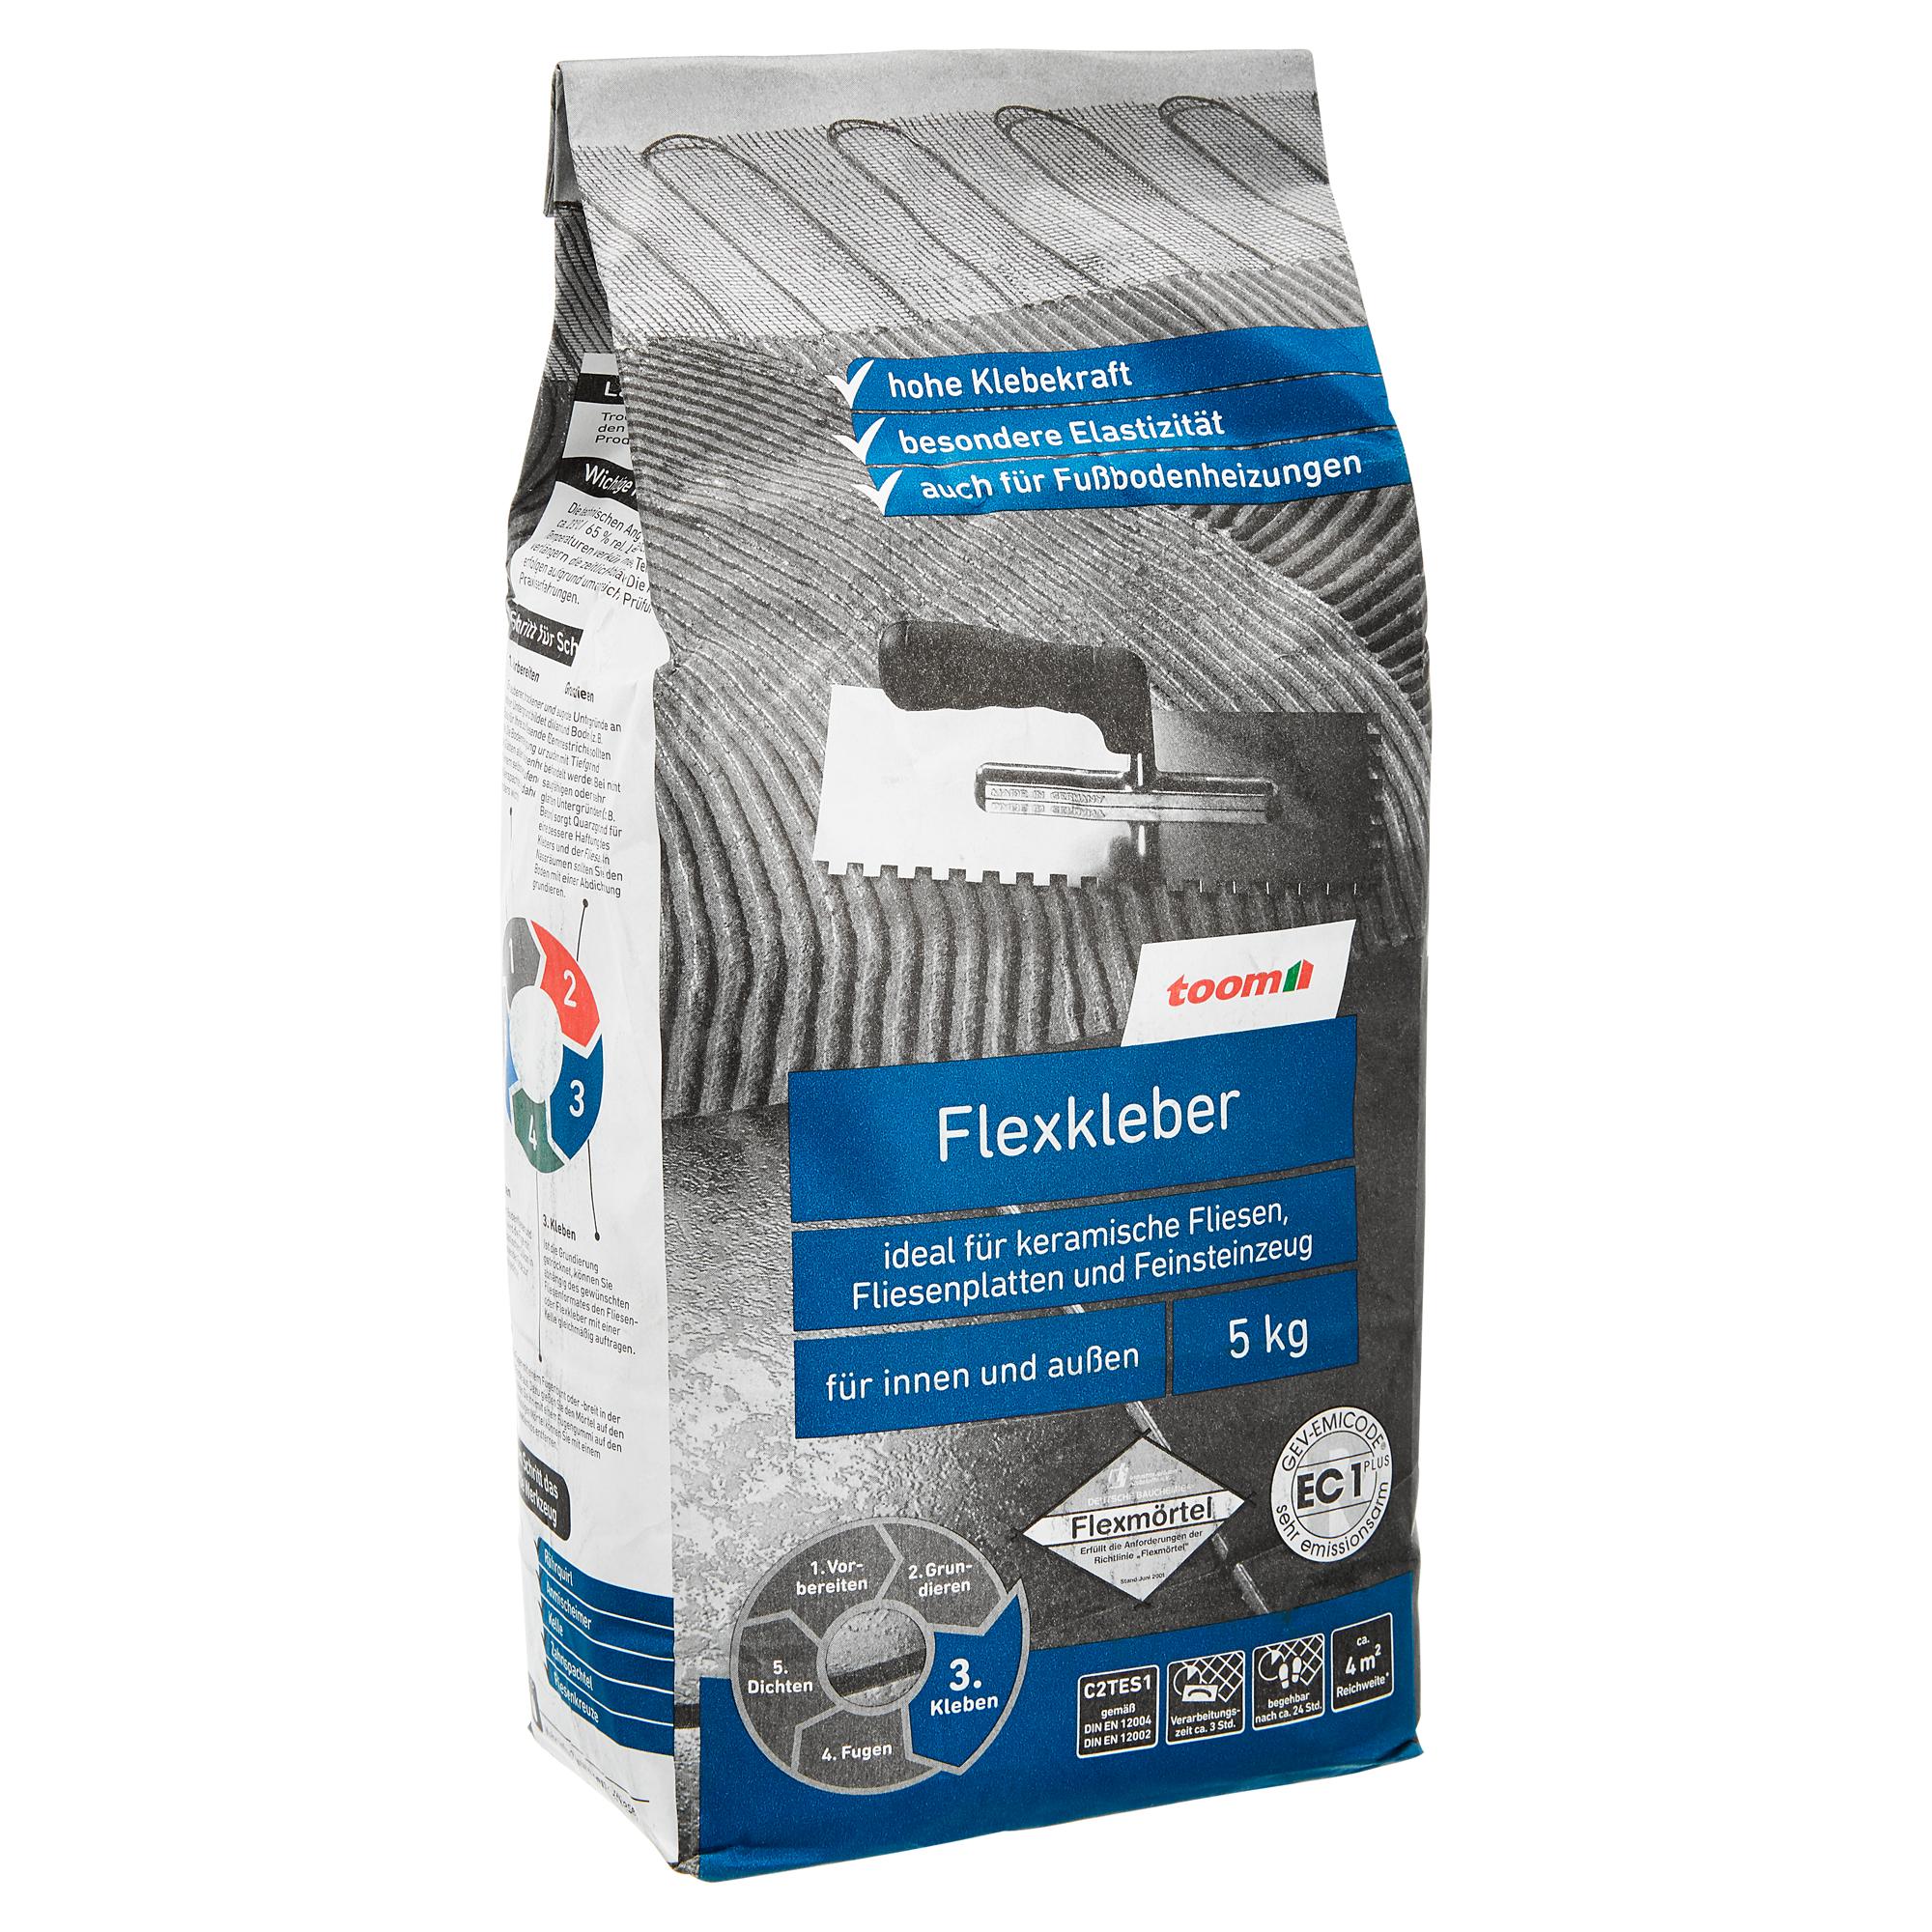 toom Flexkleber 5 kg ǀ toom Baumarkt